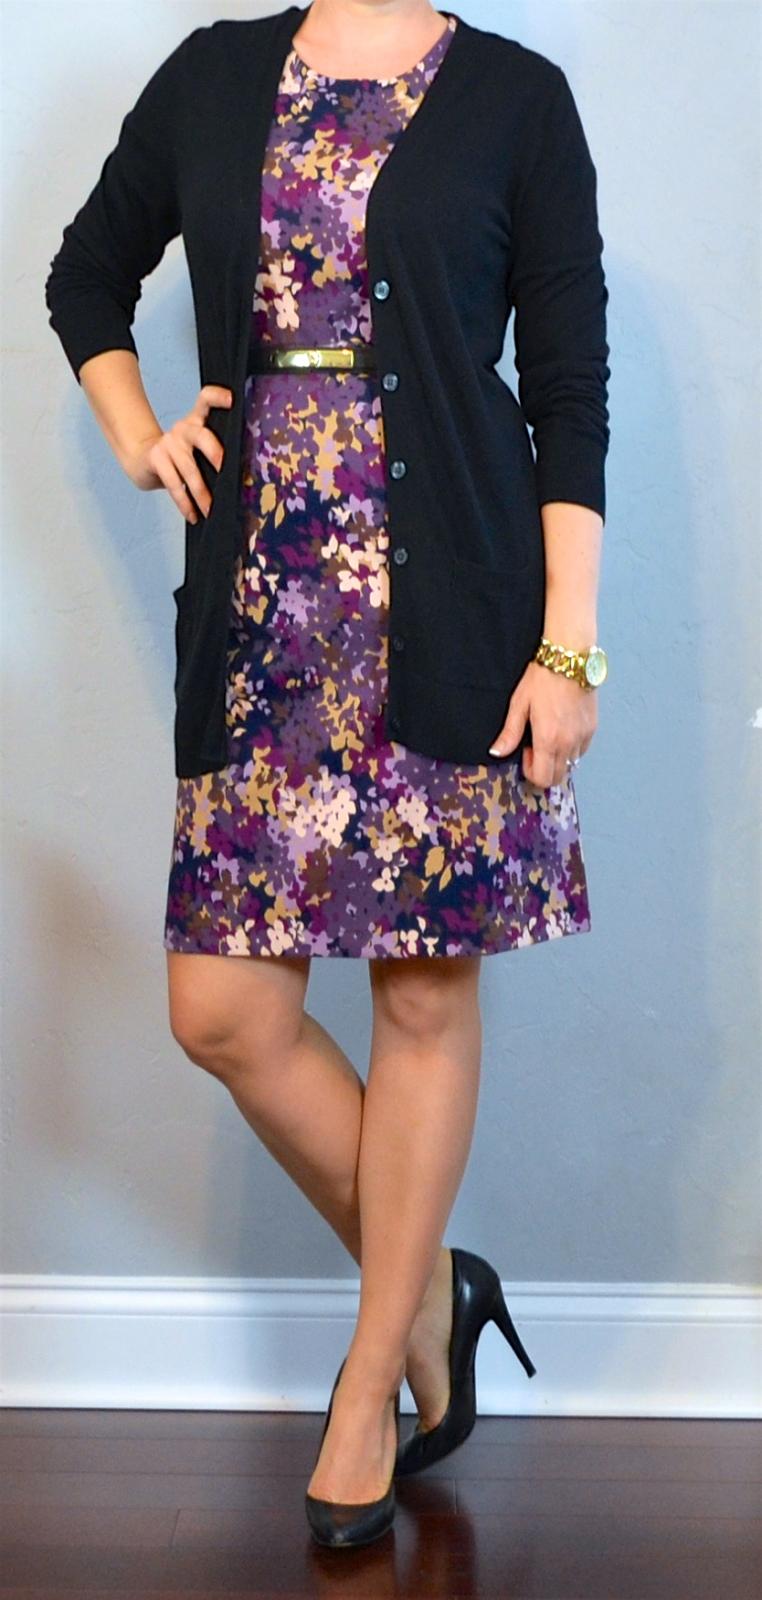 outfit post: purple floral sheath dress, purple cardigan